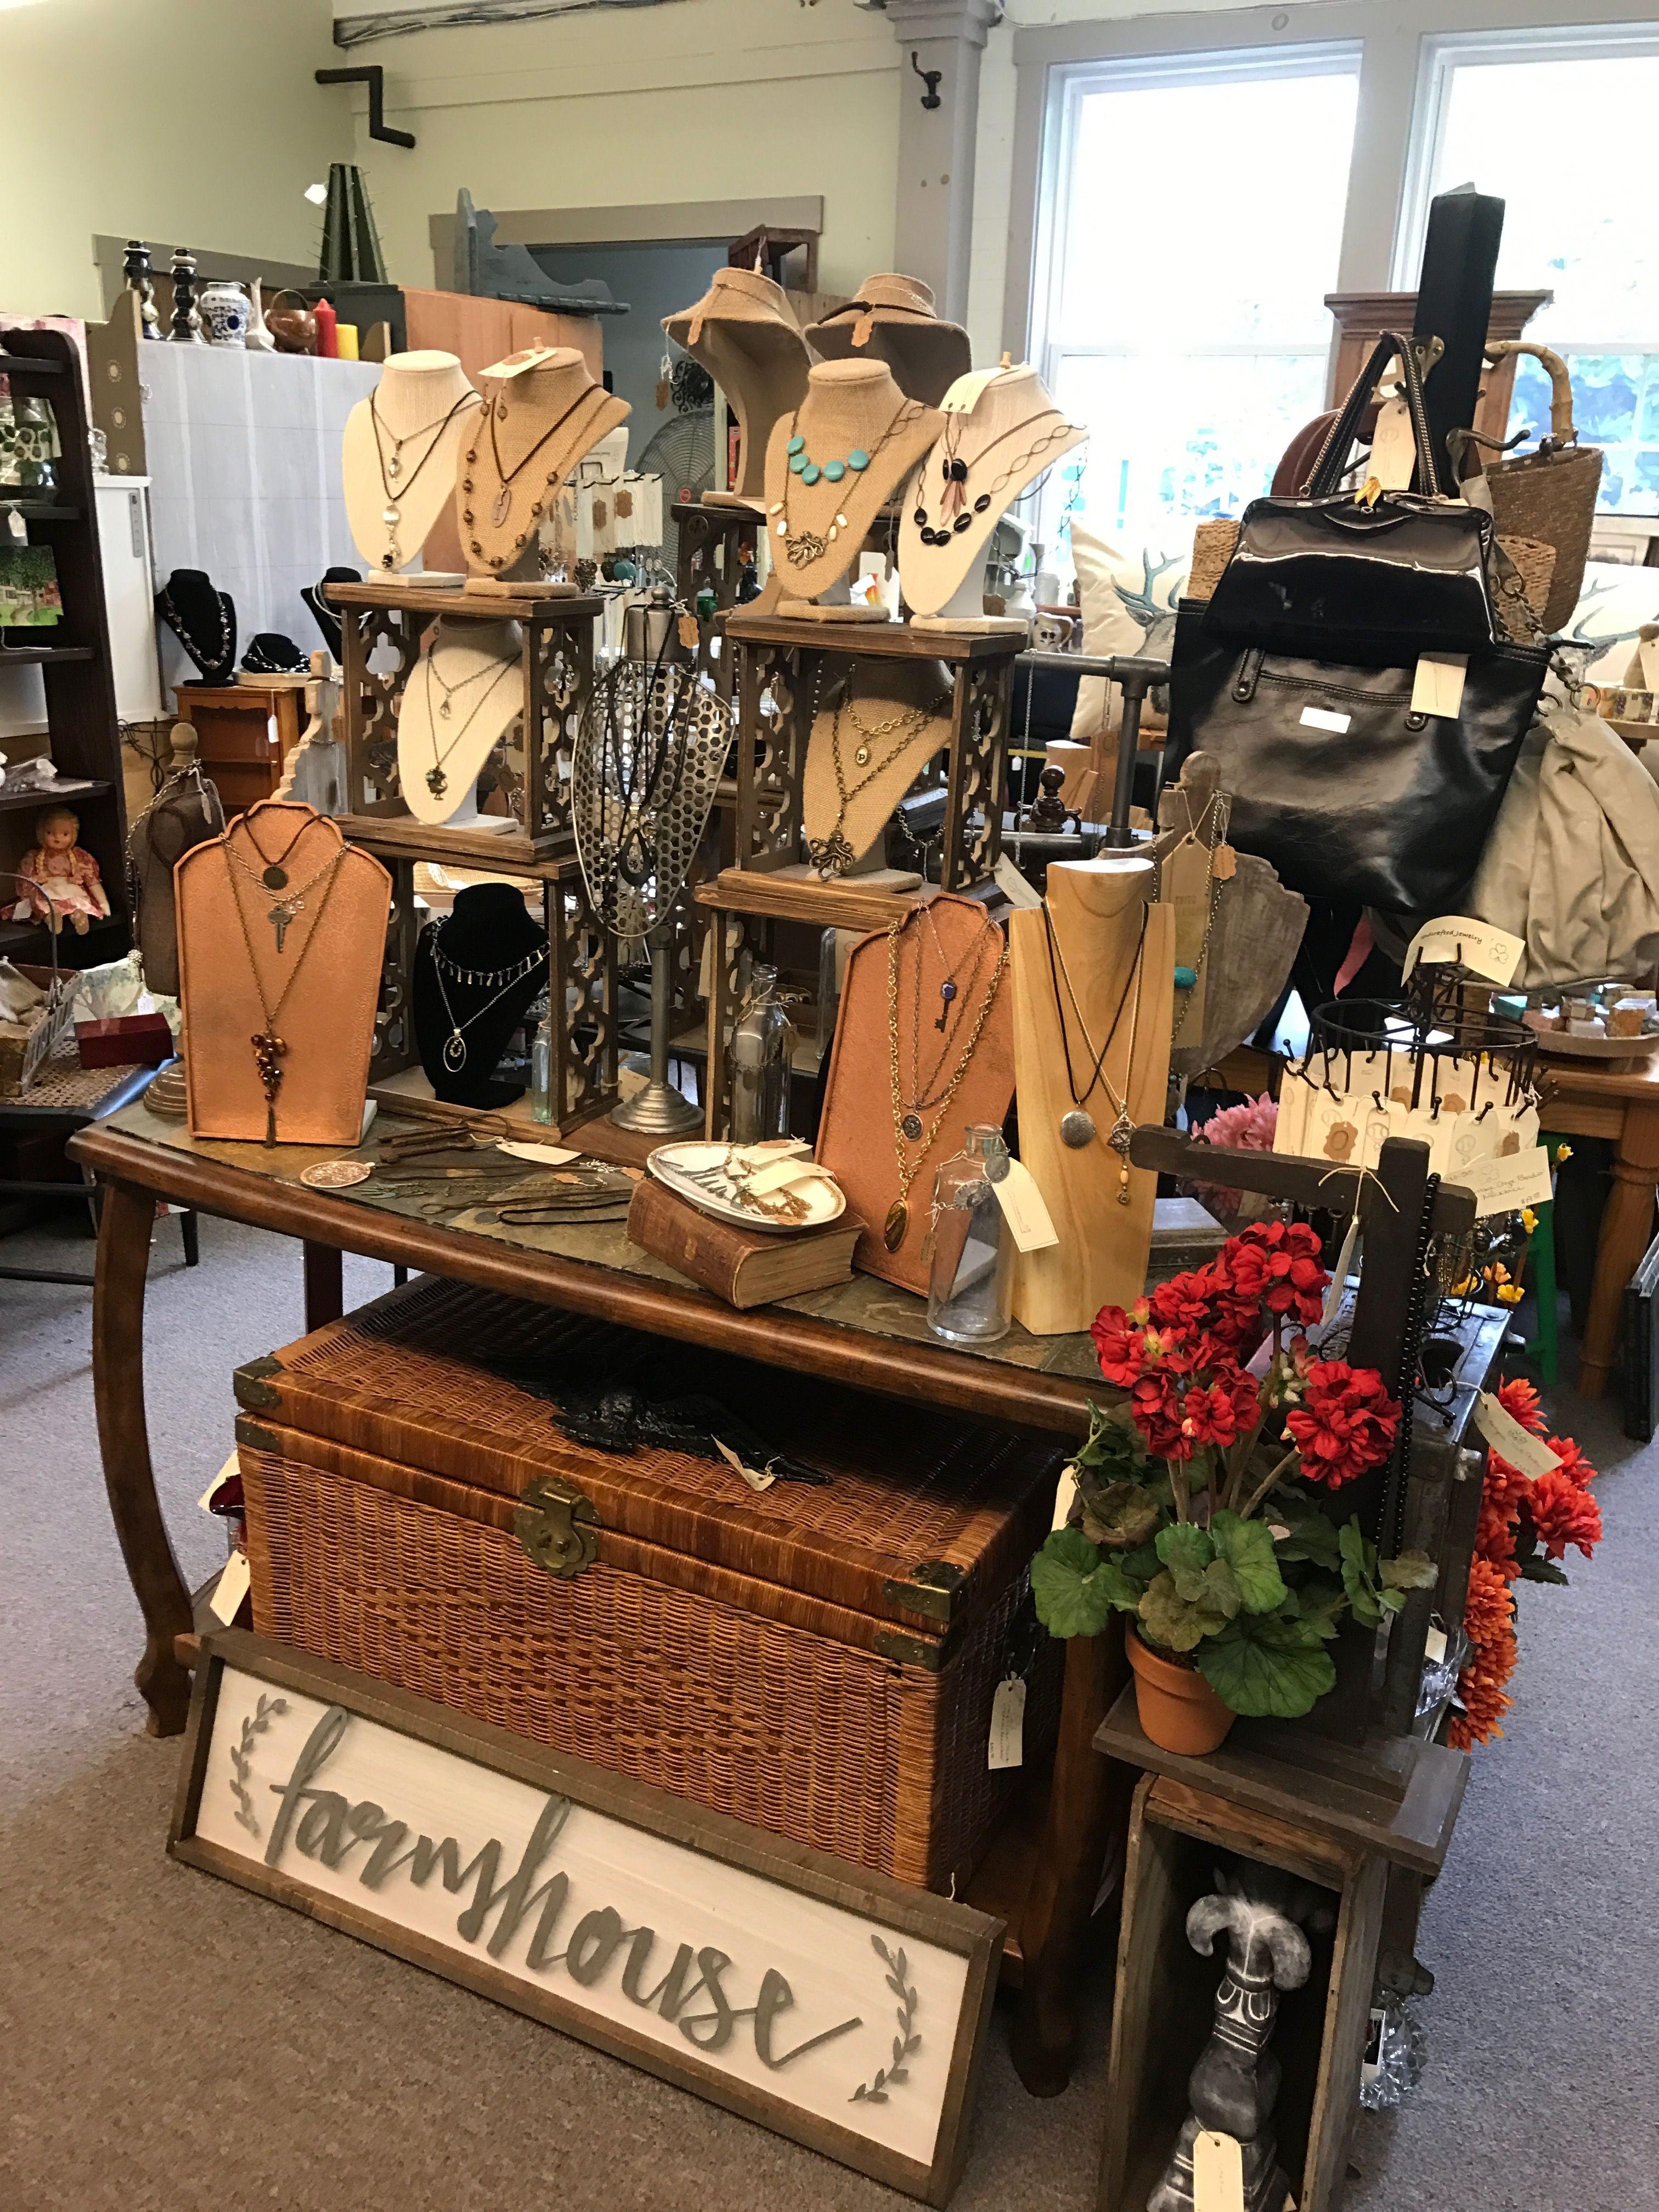 Window display ideas for jewelry  handcrafted jewelry shamrock vintage  bernat antiques uxbridge